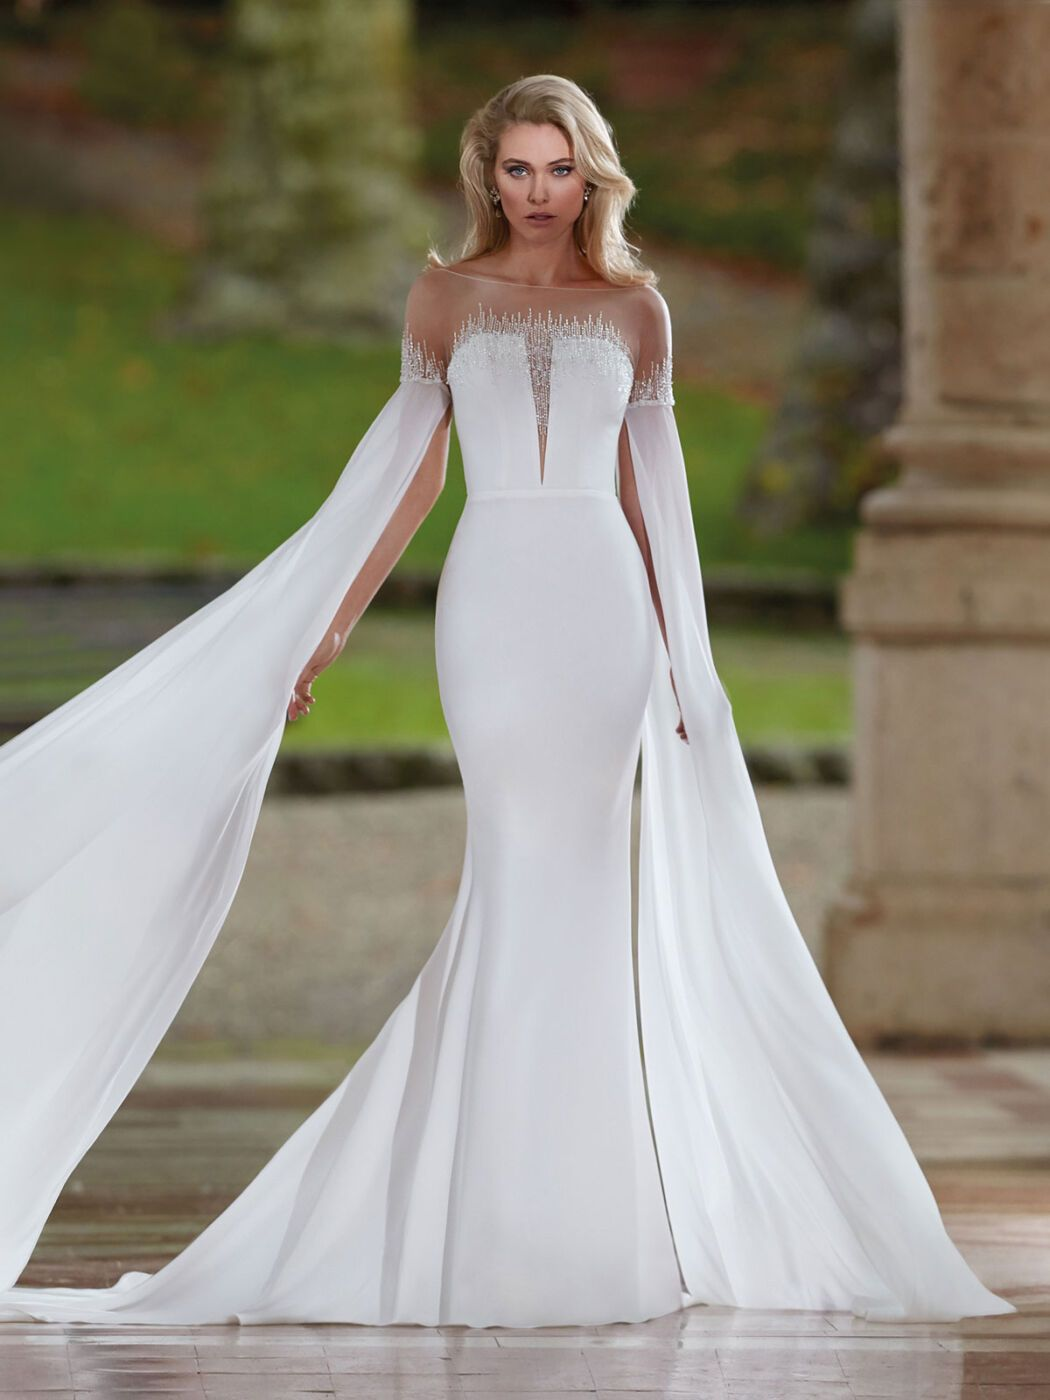 https://www.weddingmagazine.com.ua/wp-content/uploads/2020/06/nicole-2021-milano.jpg